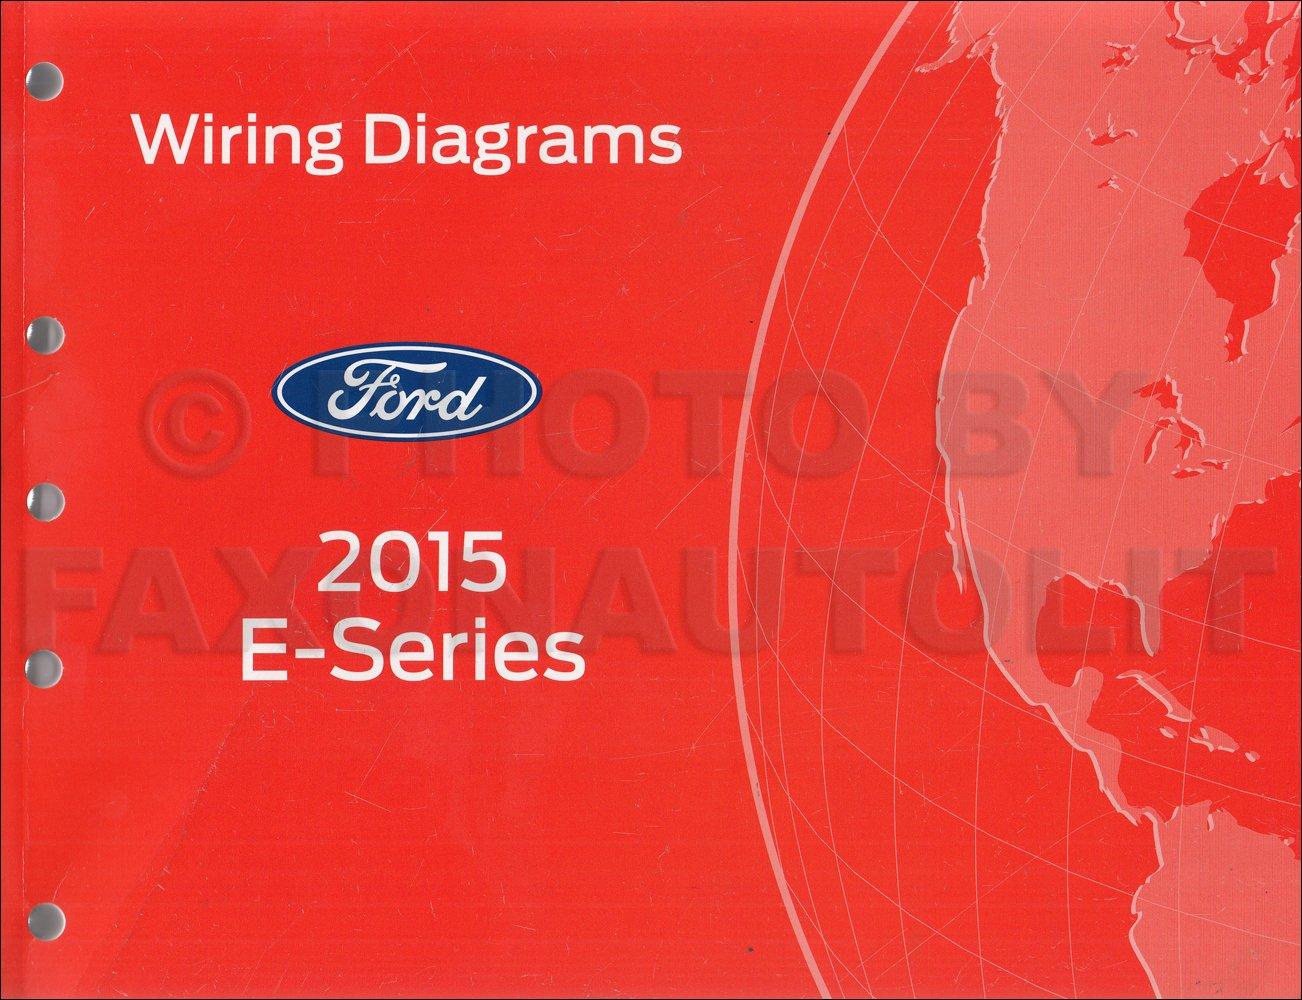 ford econoline van wiring diagram 2015 ford econoline wiring diagram manual original van e 350 e 450  2015 ford econoline wiring diagram